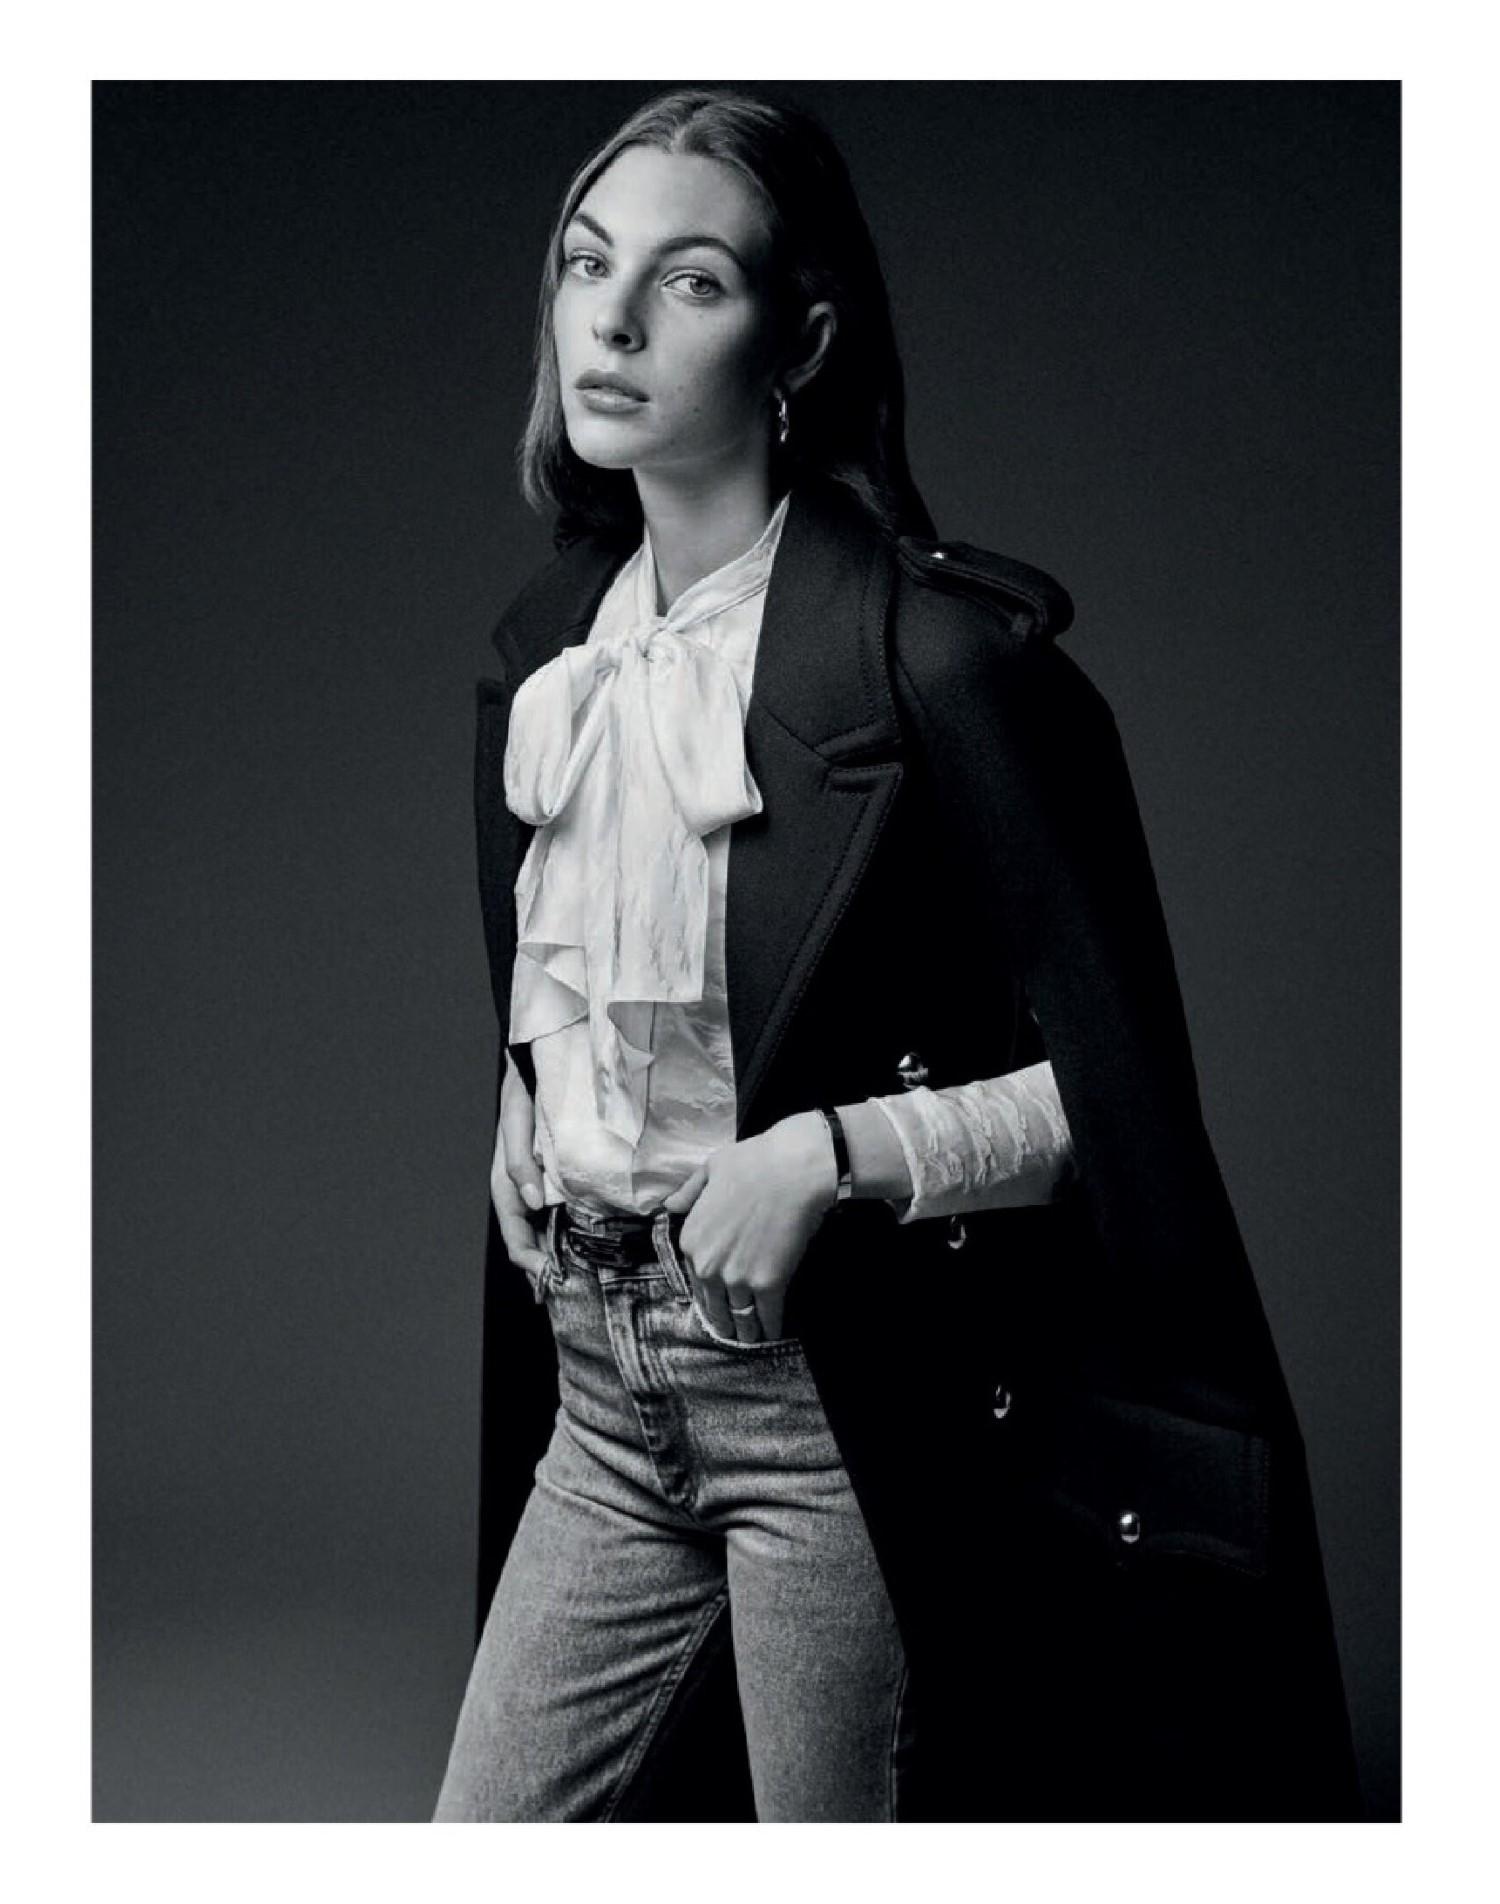 Vittoria Ceretti by Giampaolo Sgura for Vogue Paris Sept 2019 (10).jpg